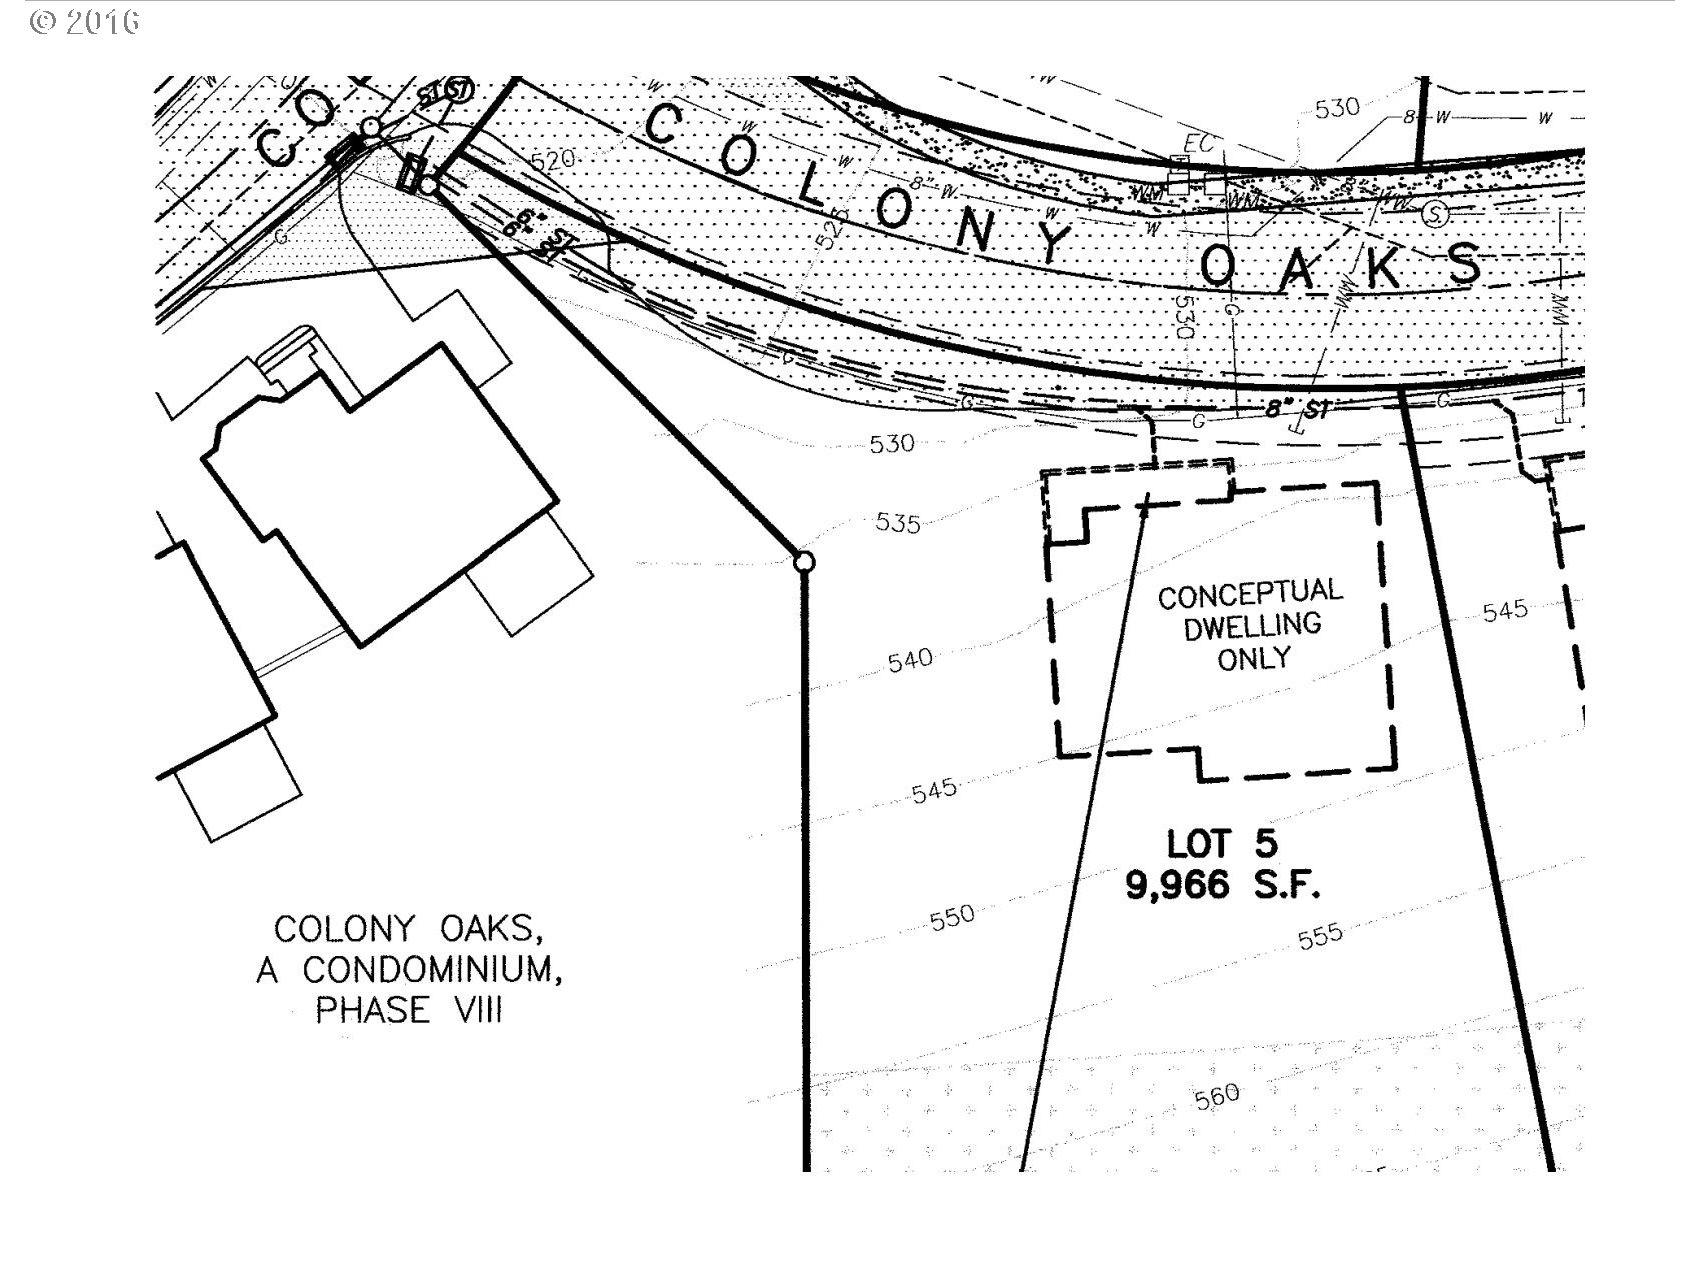 3586 Colony Oaks DR, Eugene, OR 97405